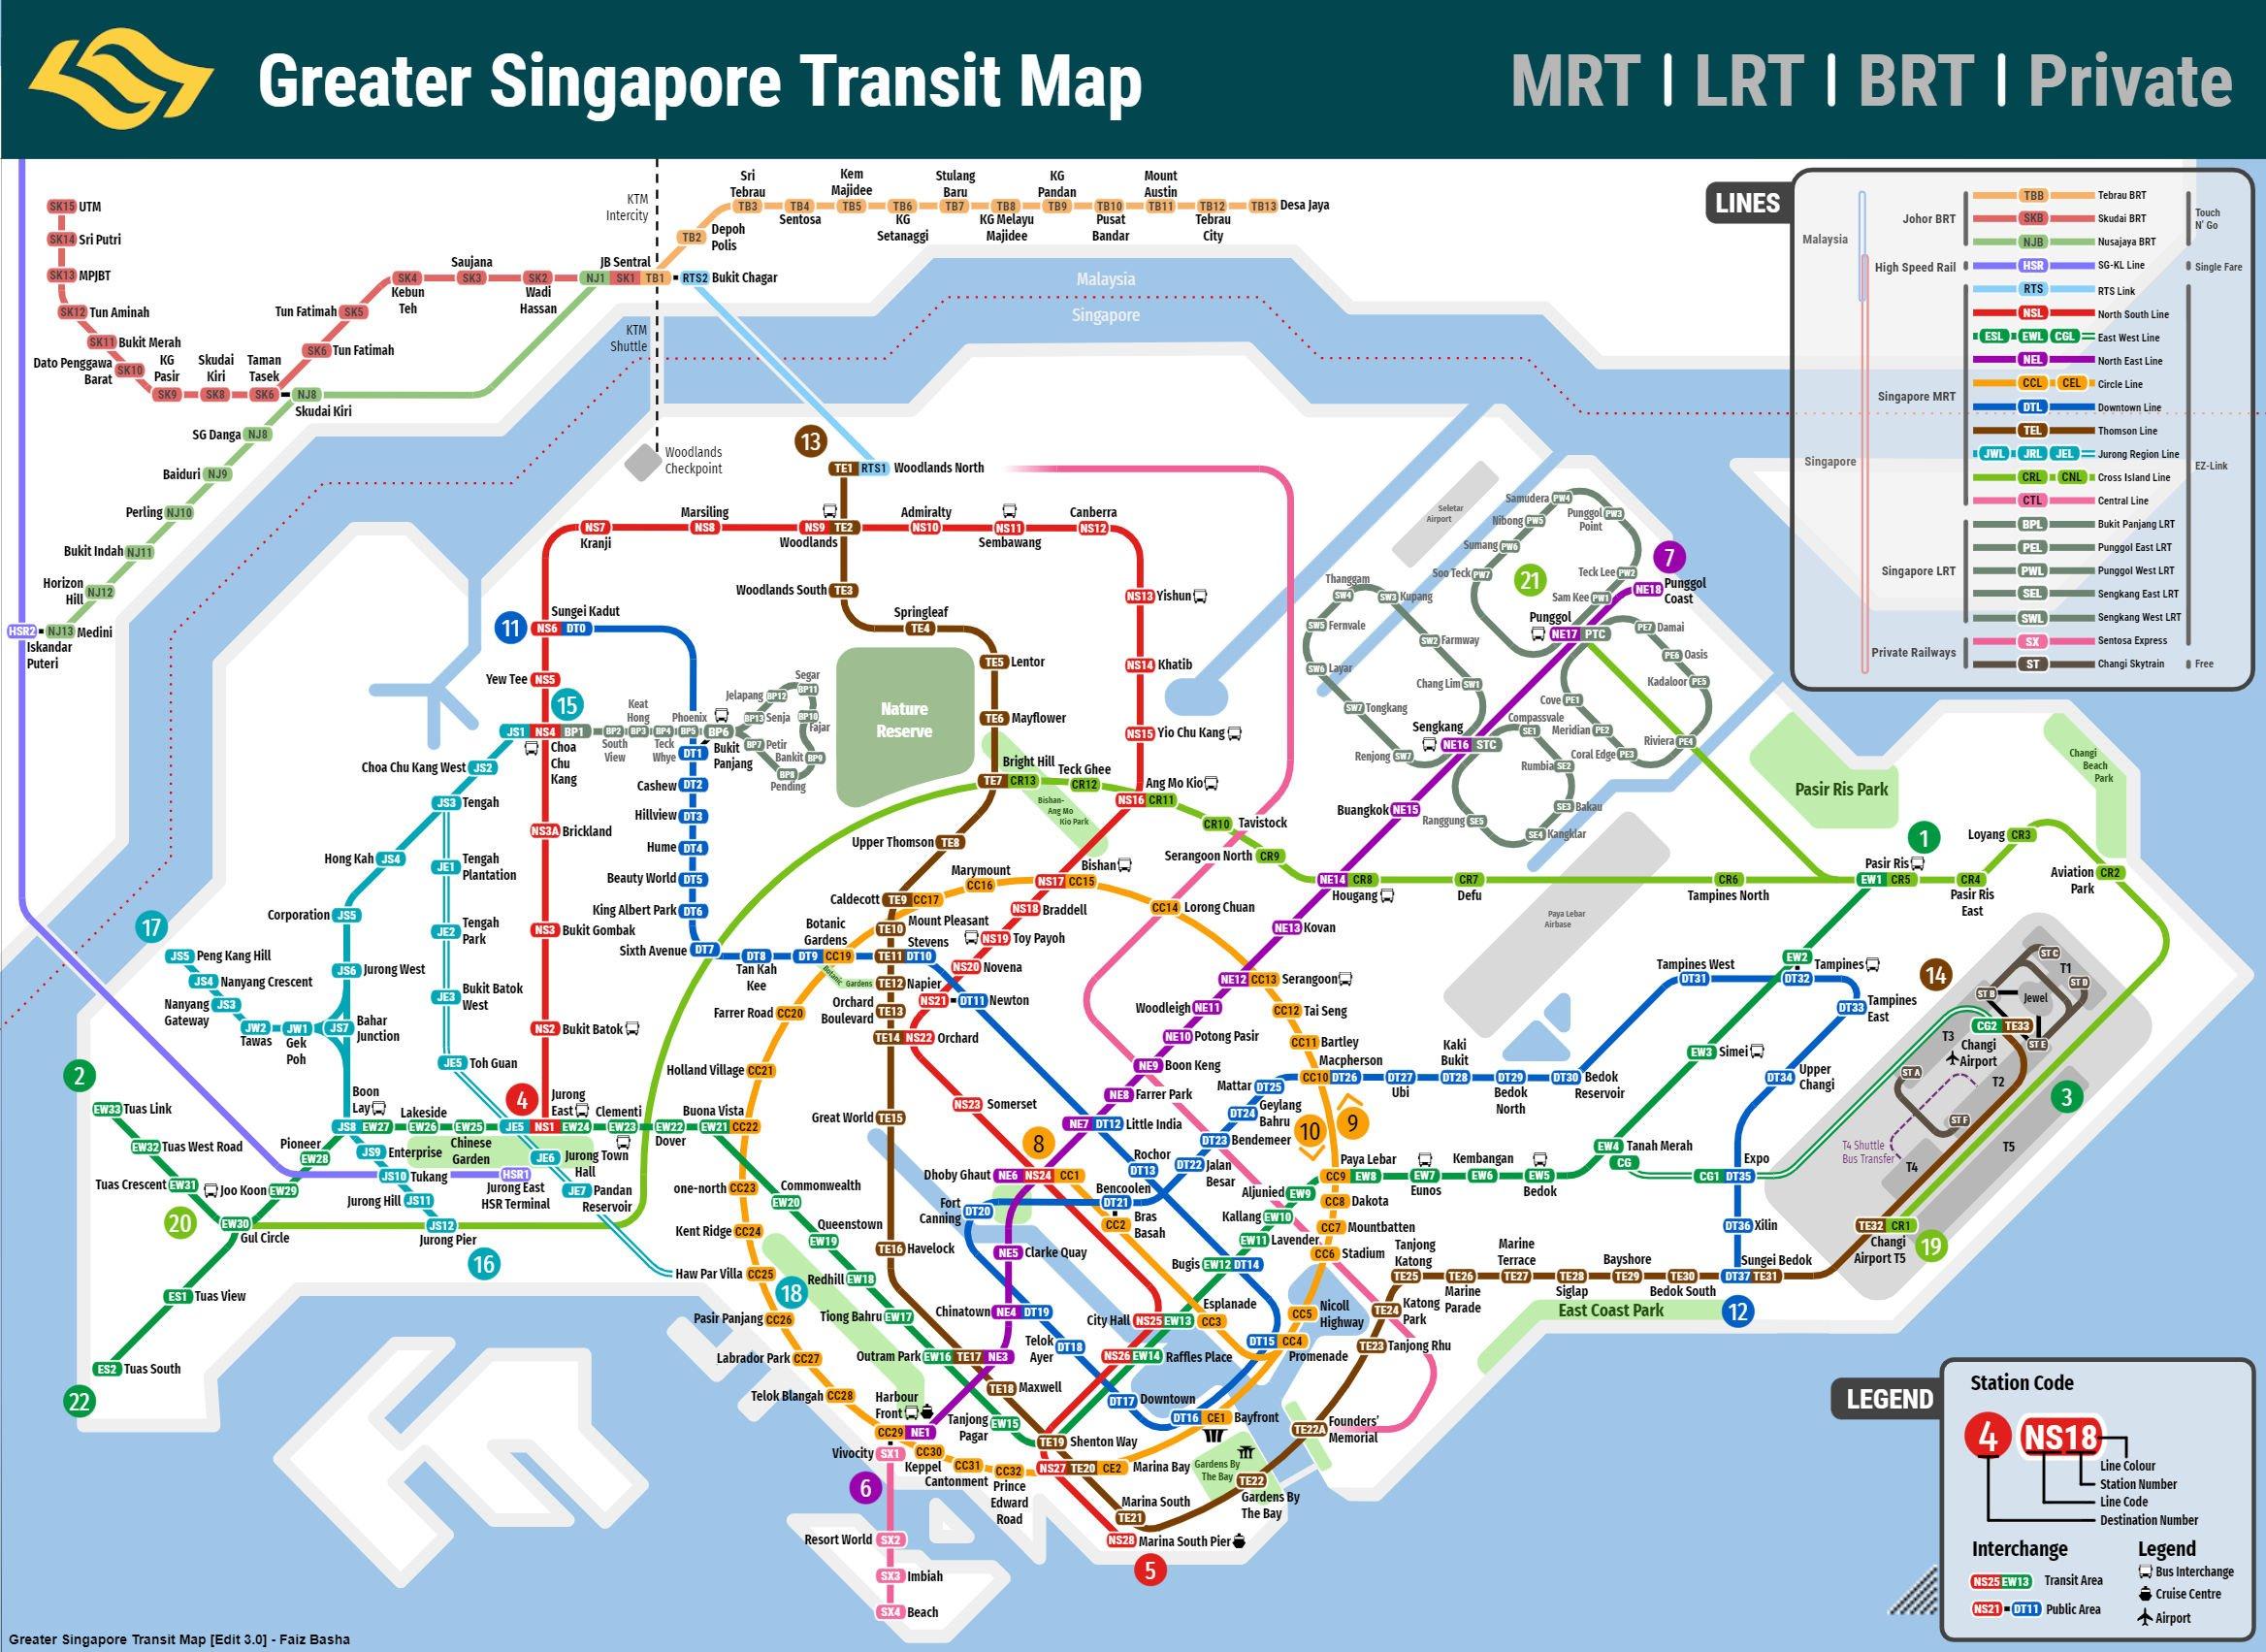 S'porean Redesigns MRT Map Again, Includes Parks, Landmarks